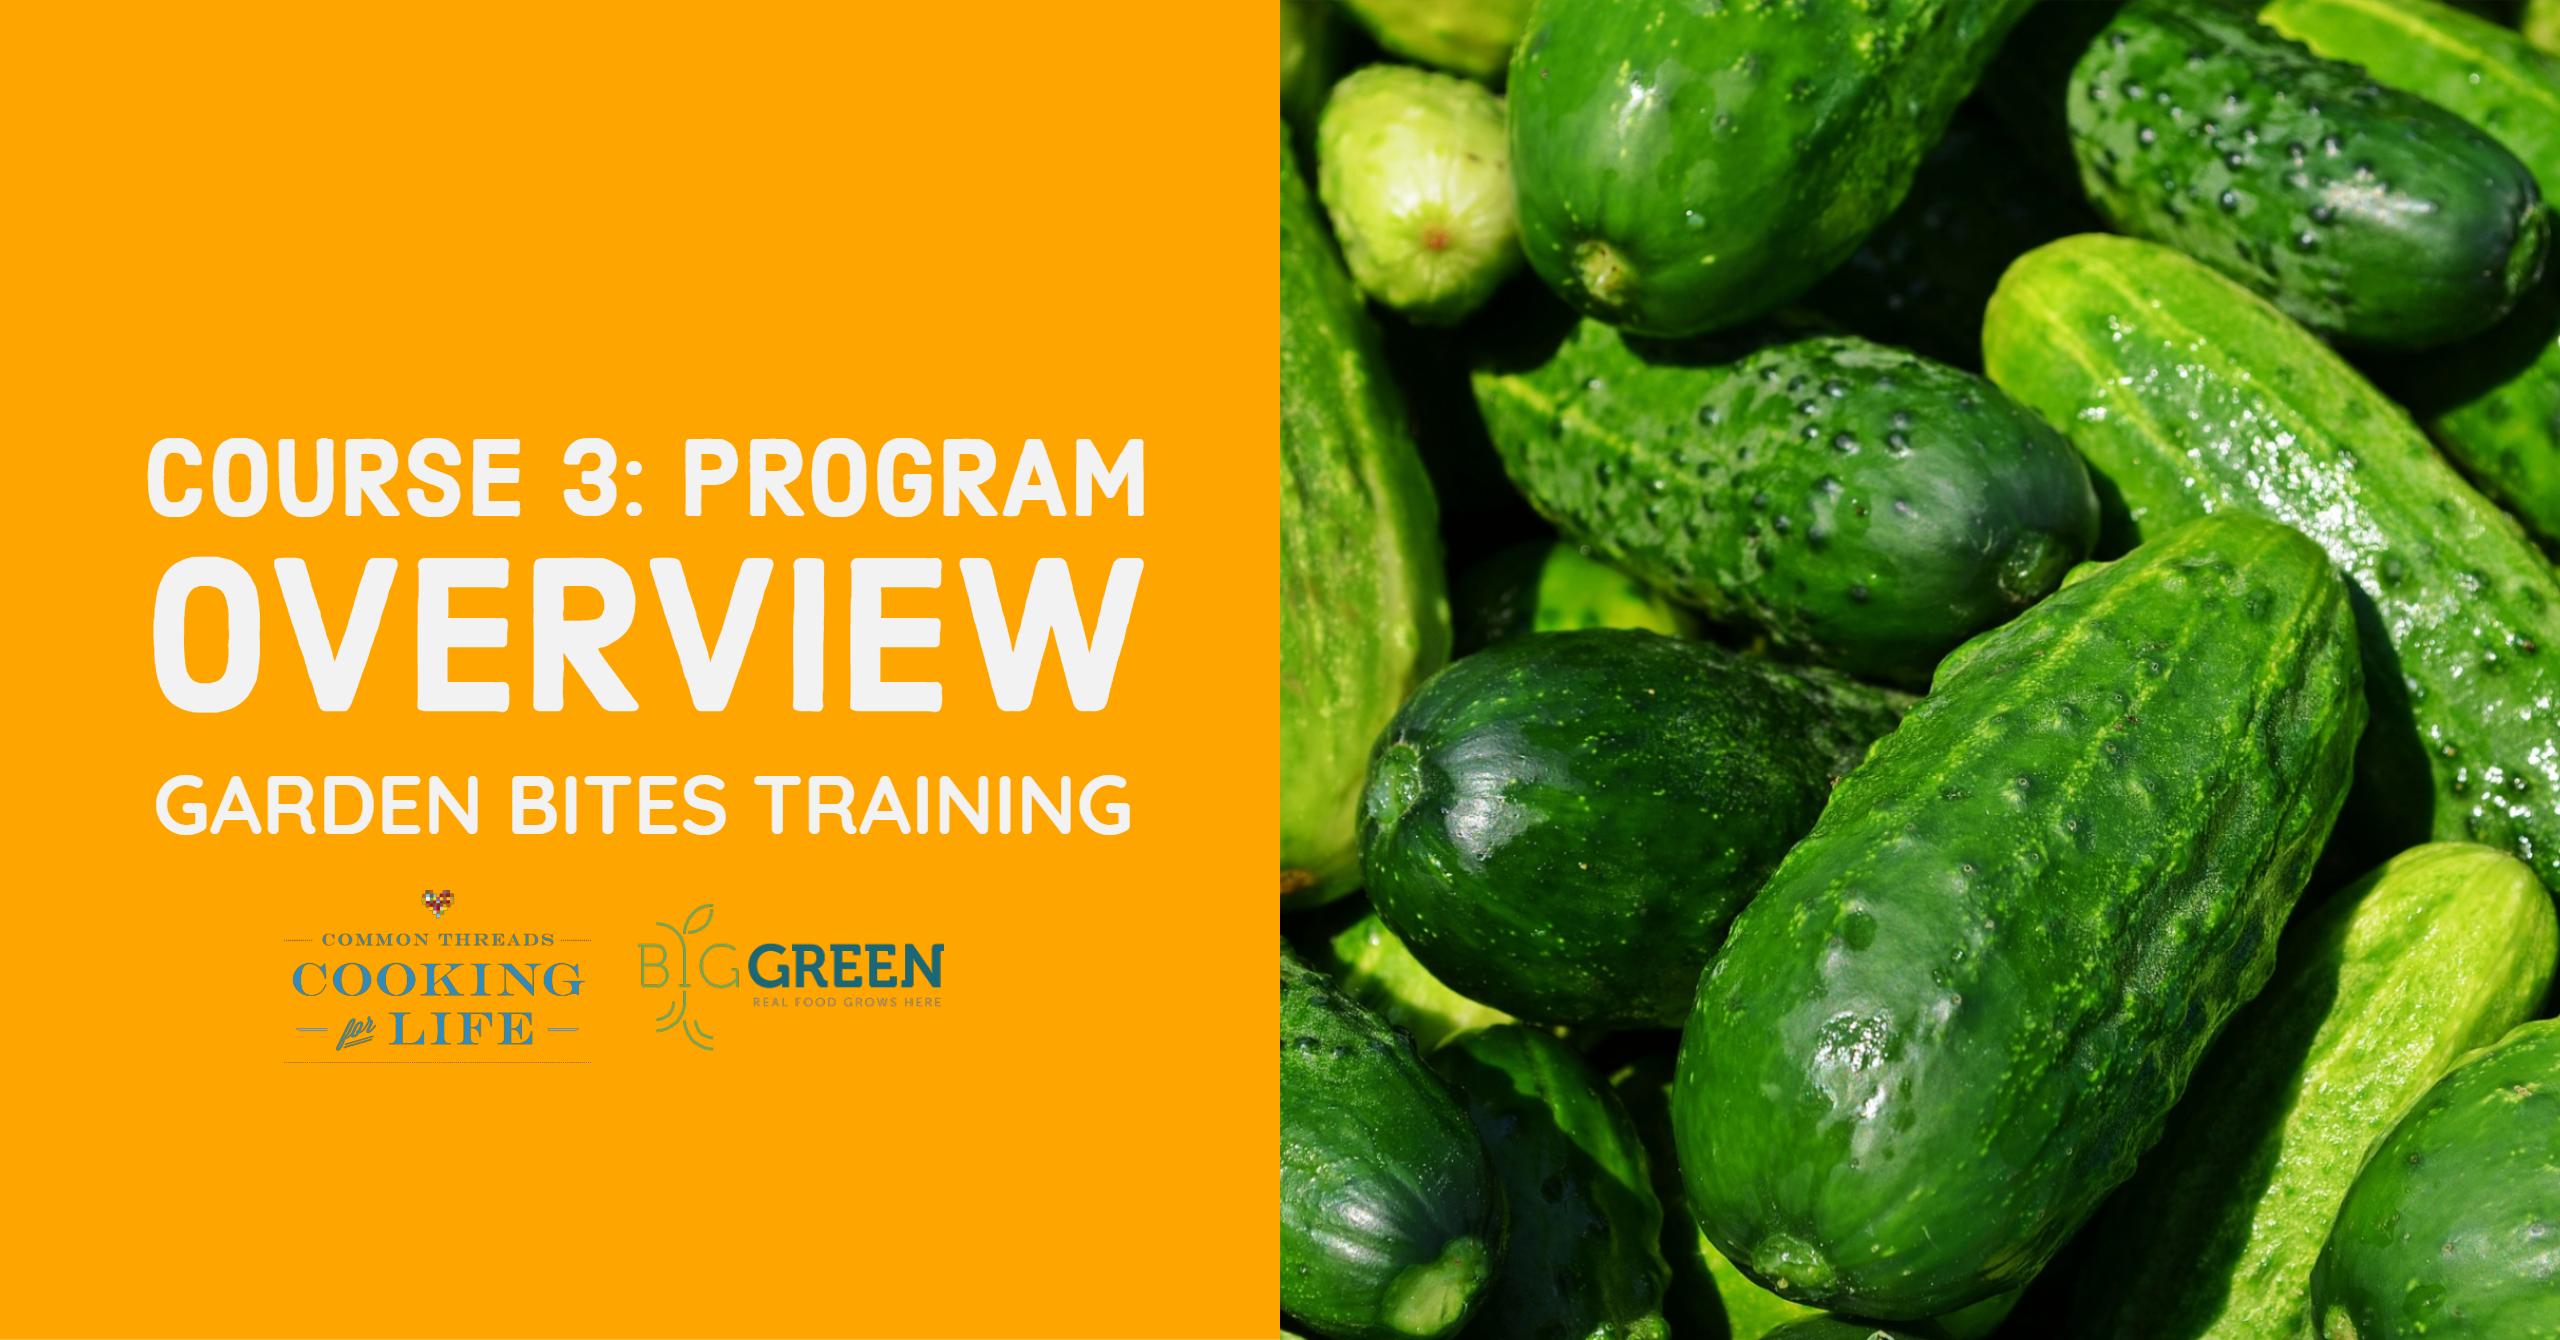 Garden Bites Training for CT: Program Overview & Structures